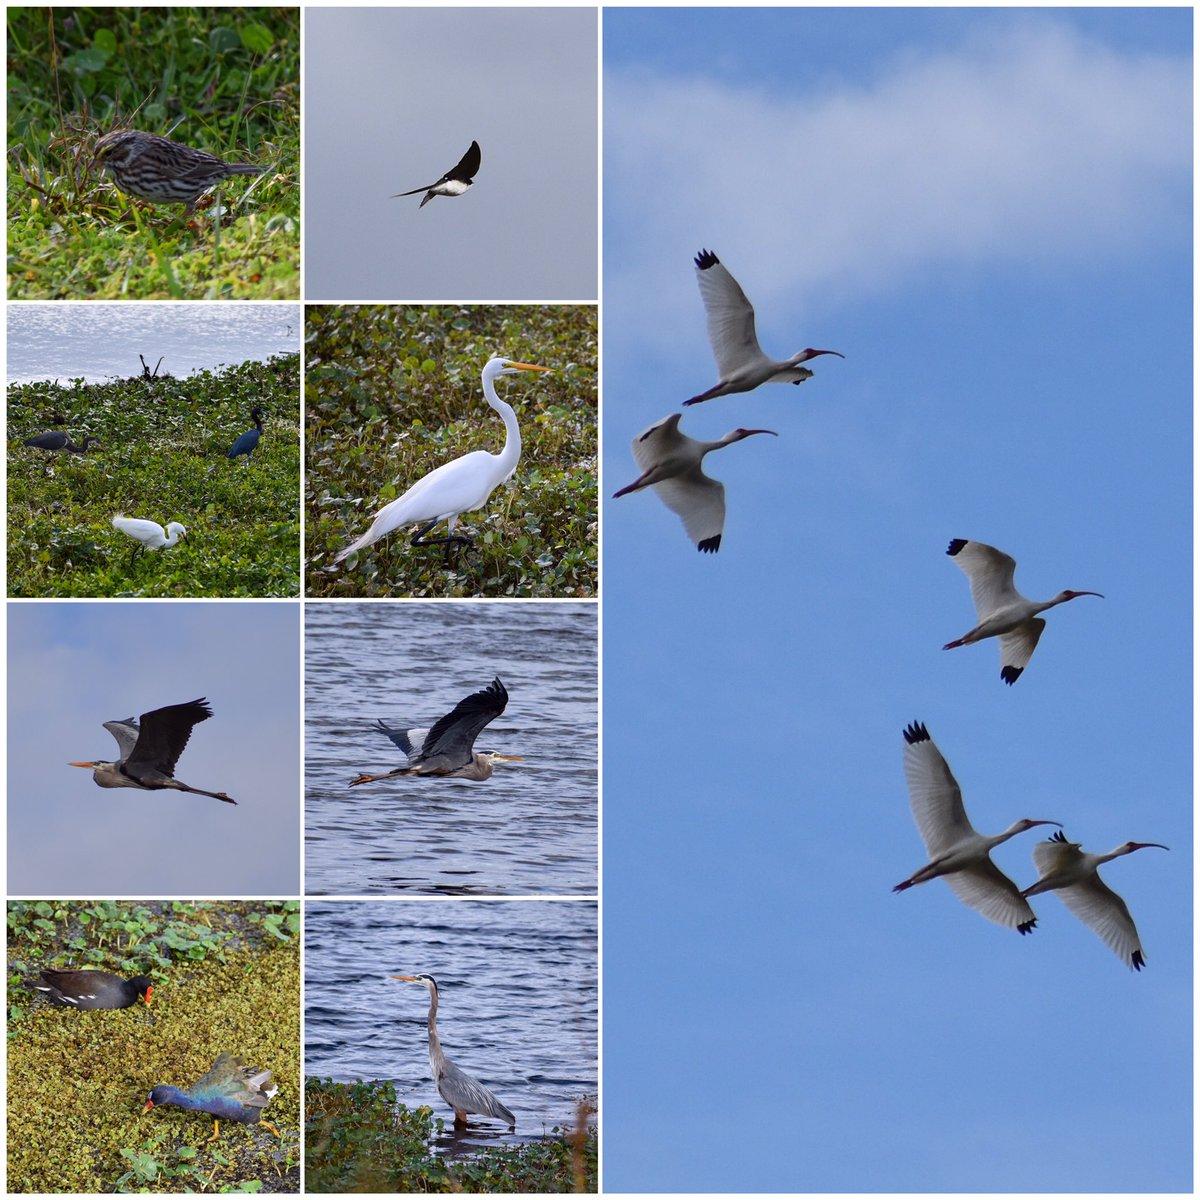 Birding at Sweetwater Wetlands park.